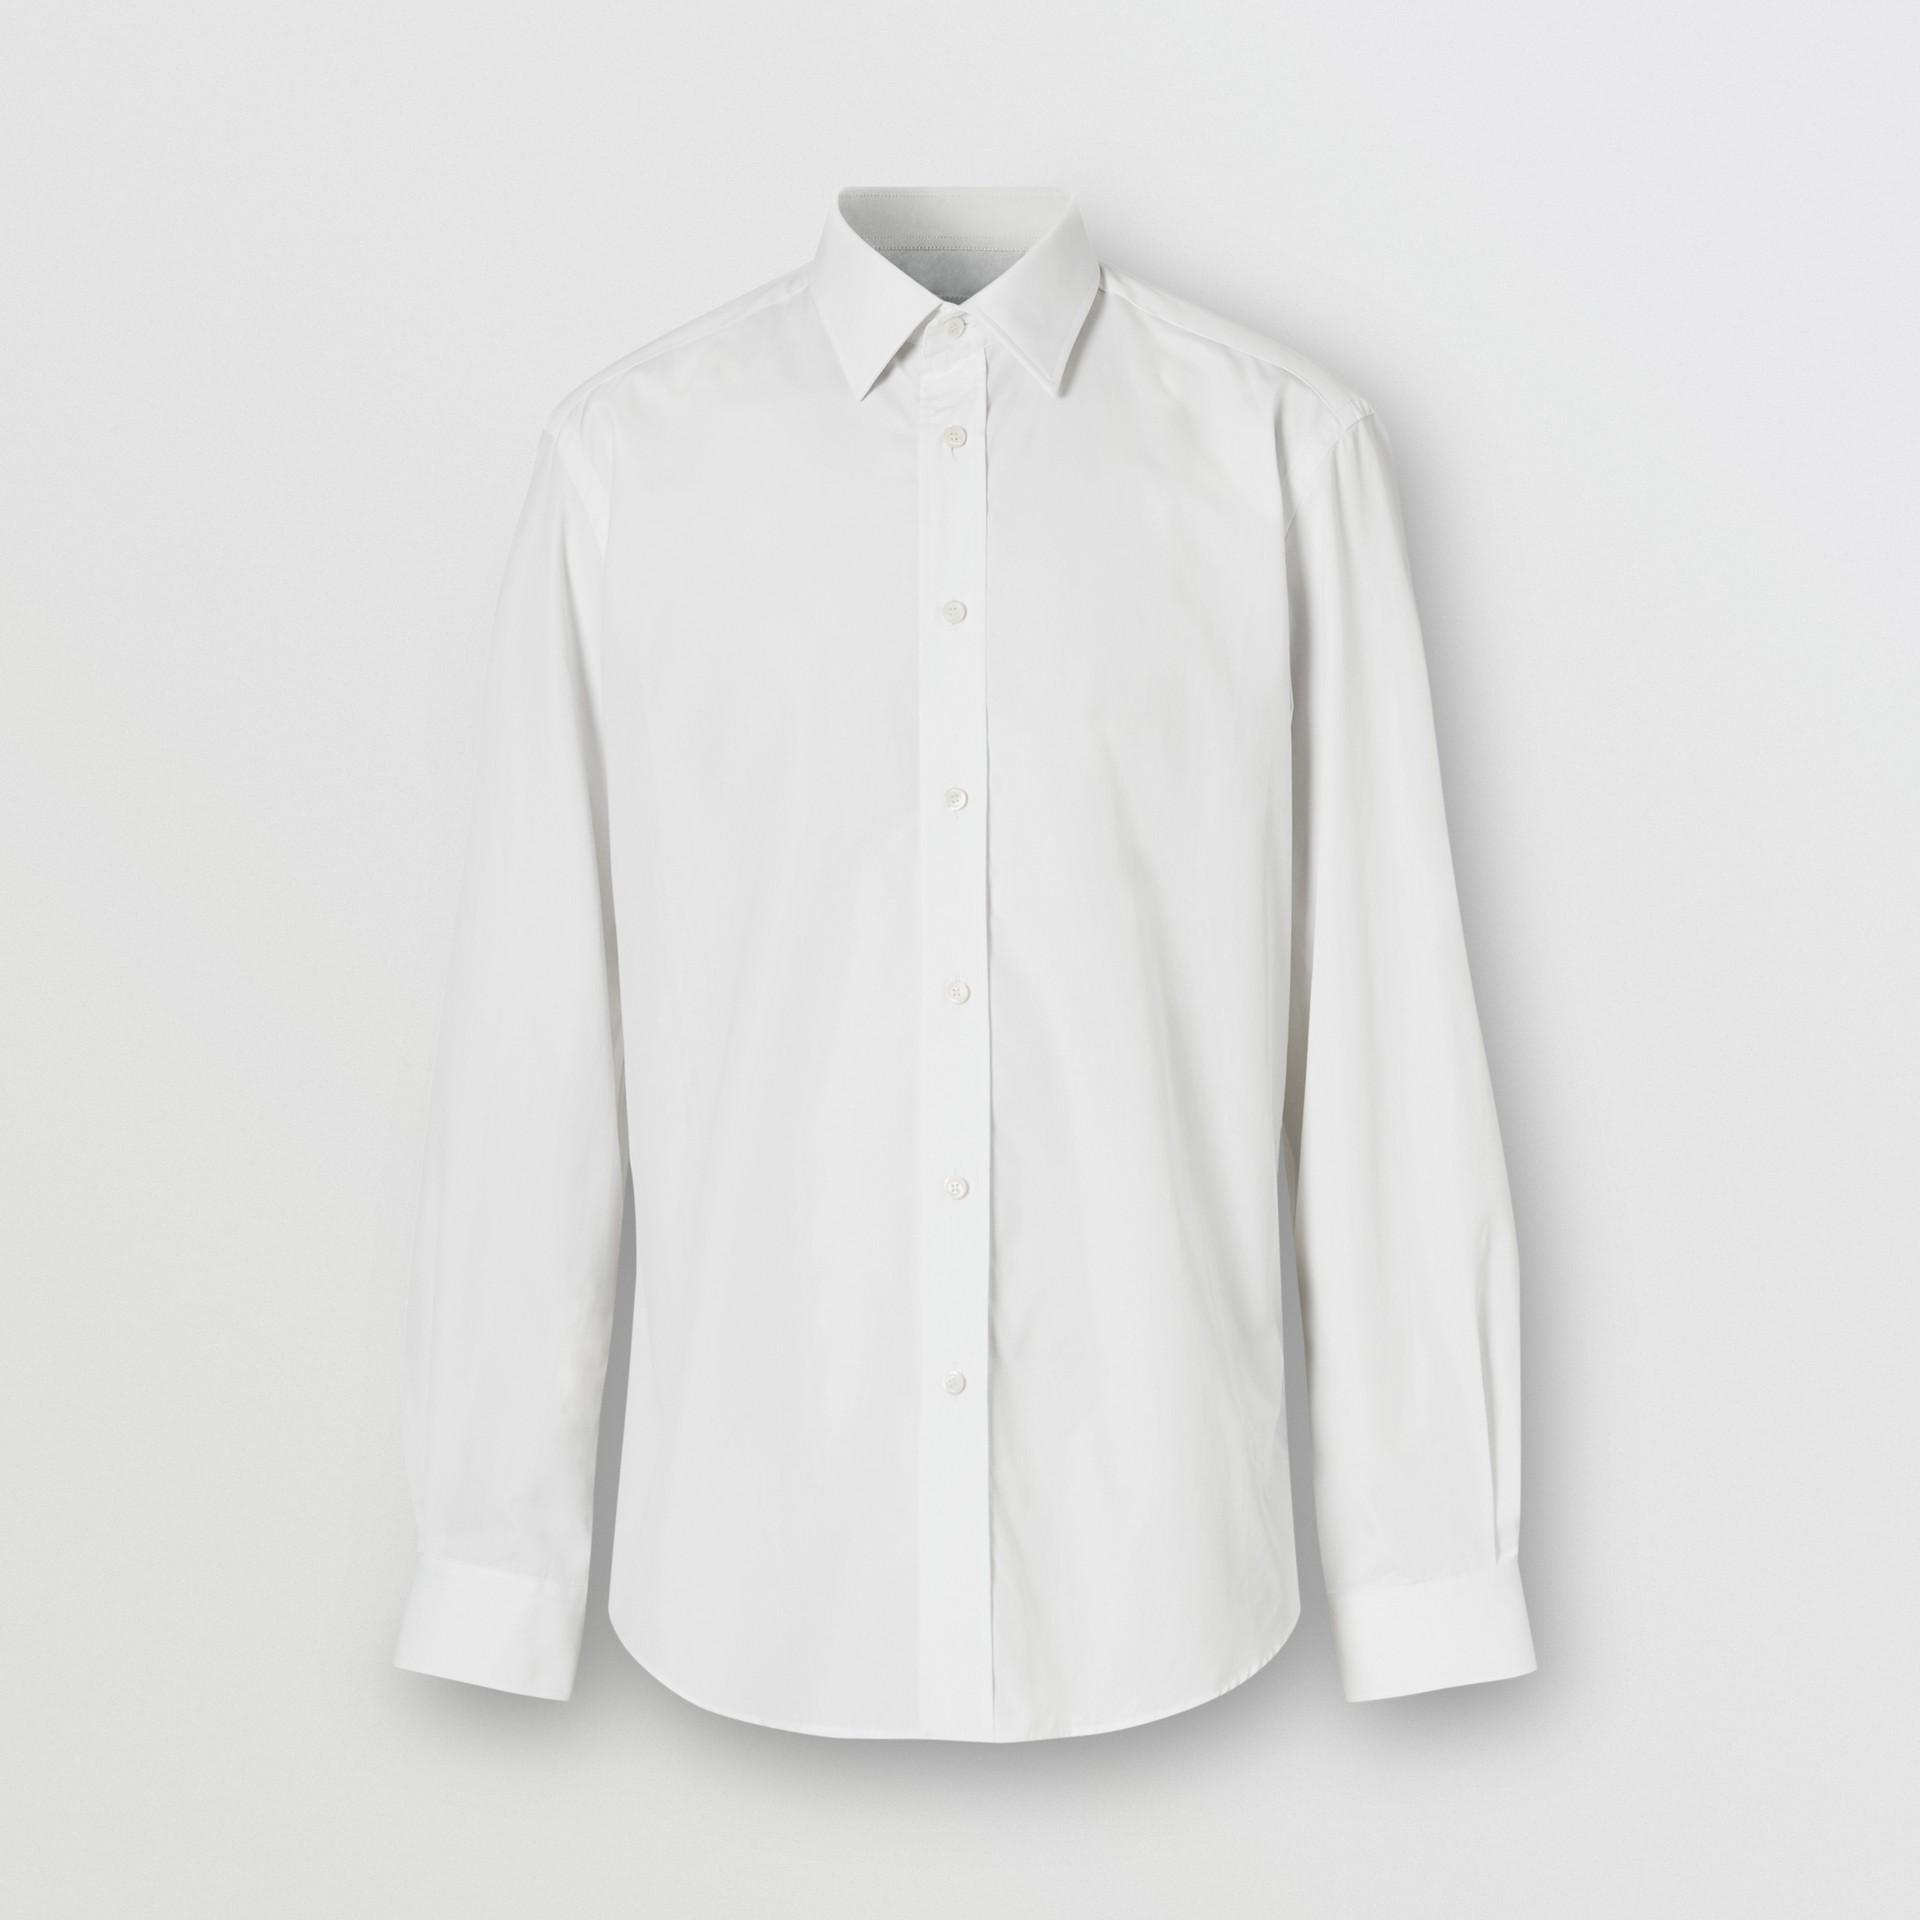 Classic Fit Monogram Motif Cotton Poplin Shirt in White - Men | Burberry United Kingdom - gallery image 3